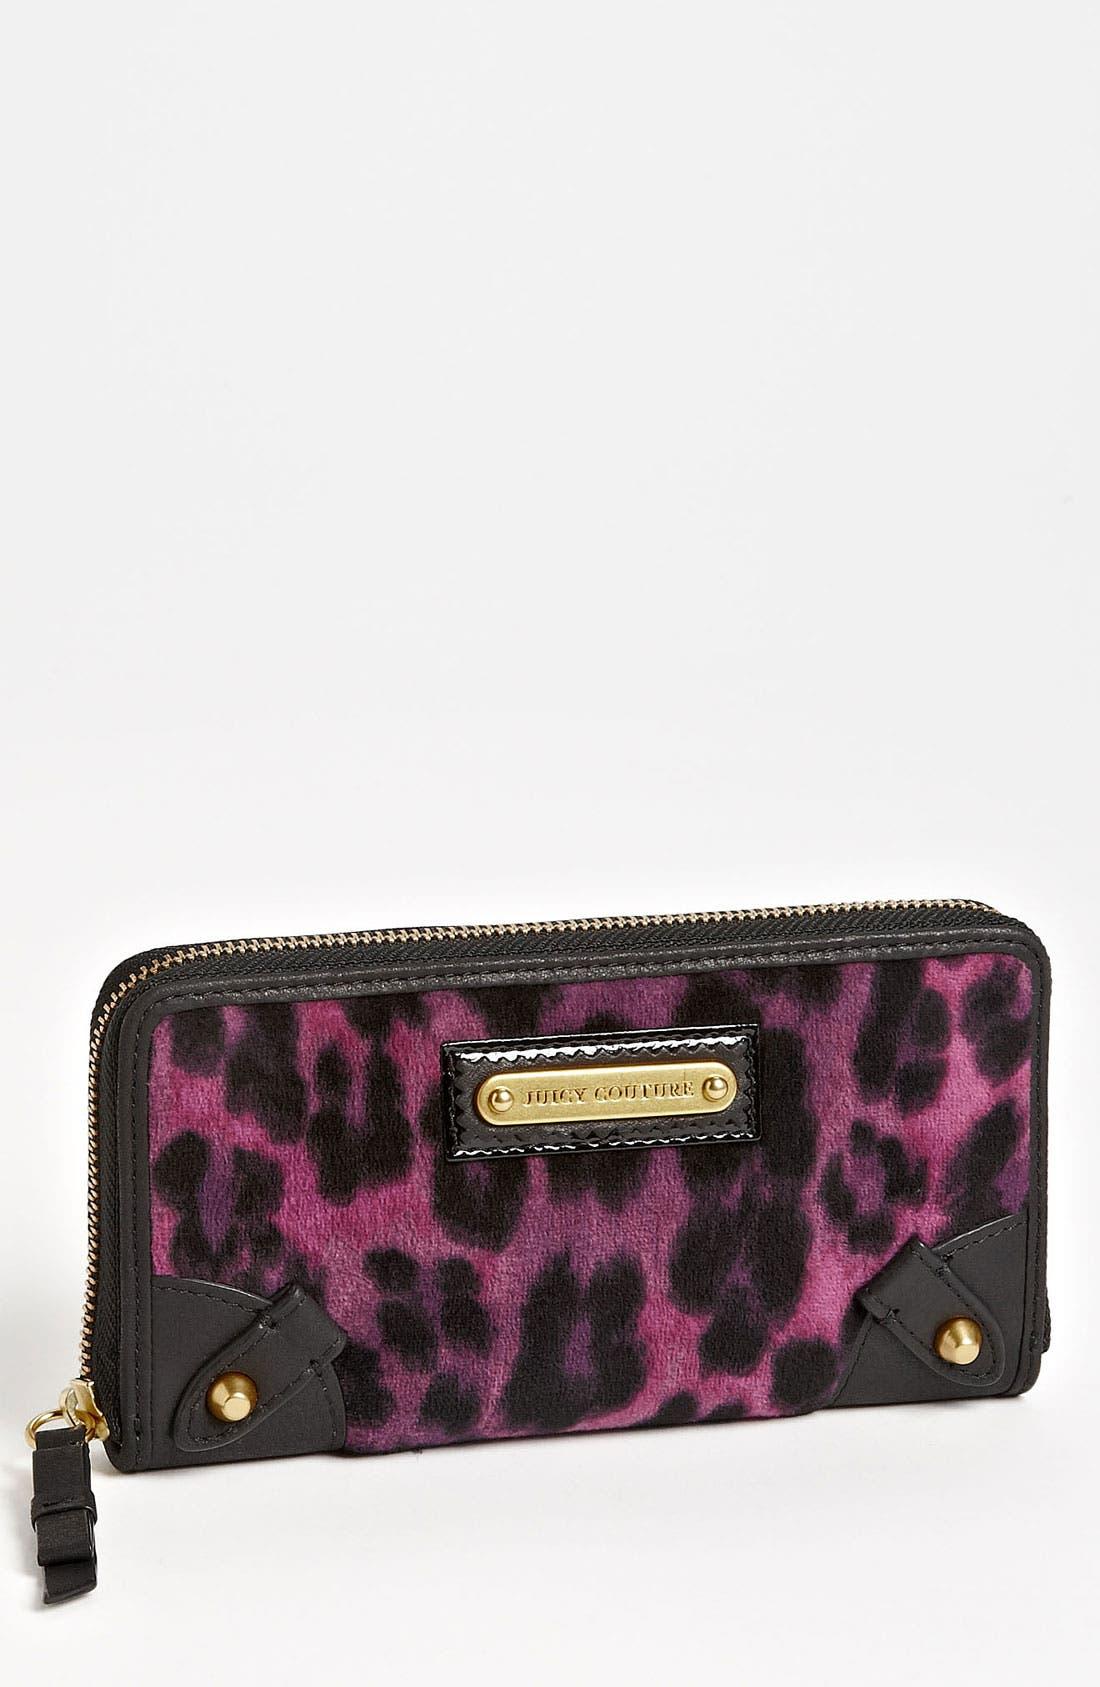 Main Image - Juicy Couture 'Wild Things' Zip Wallet